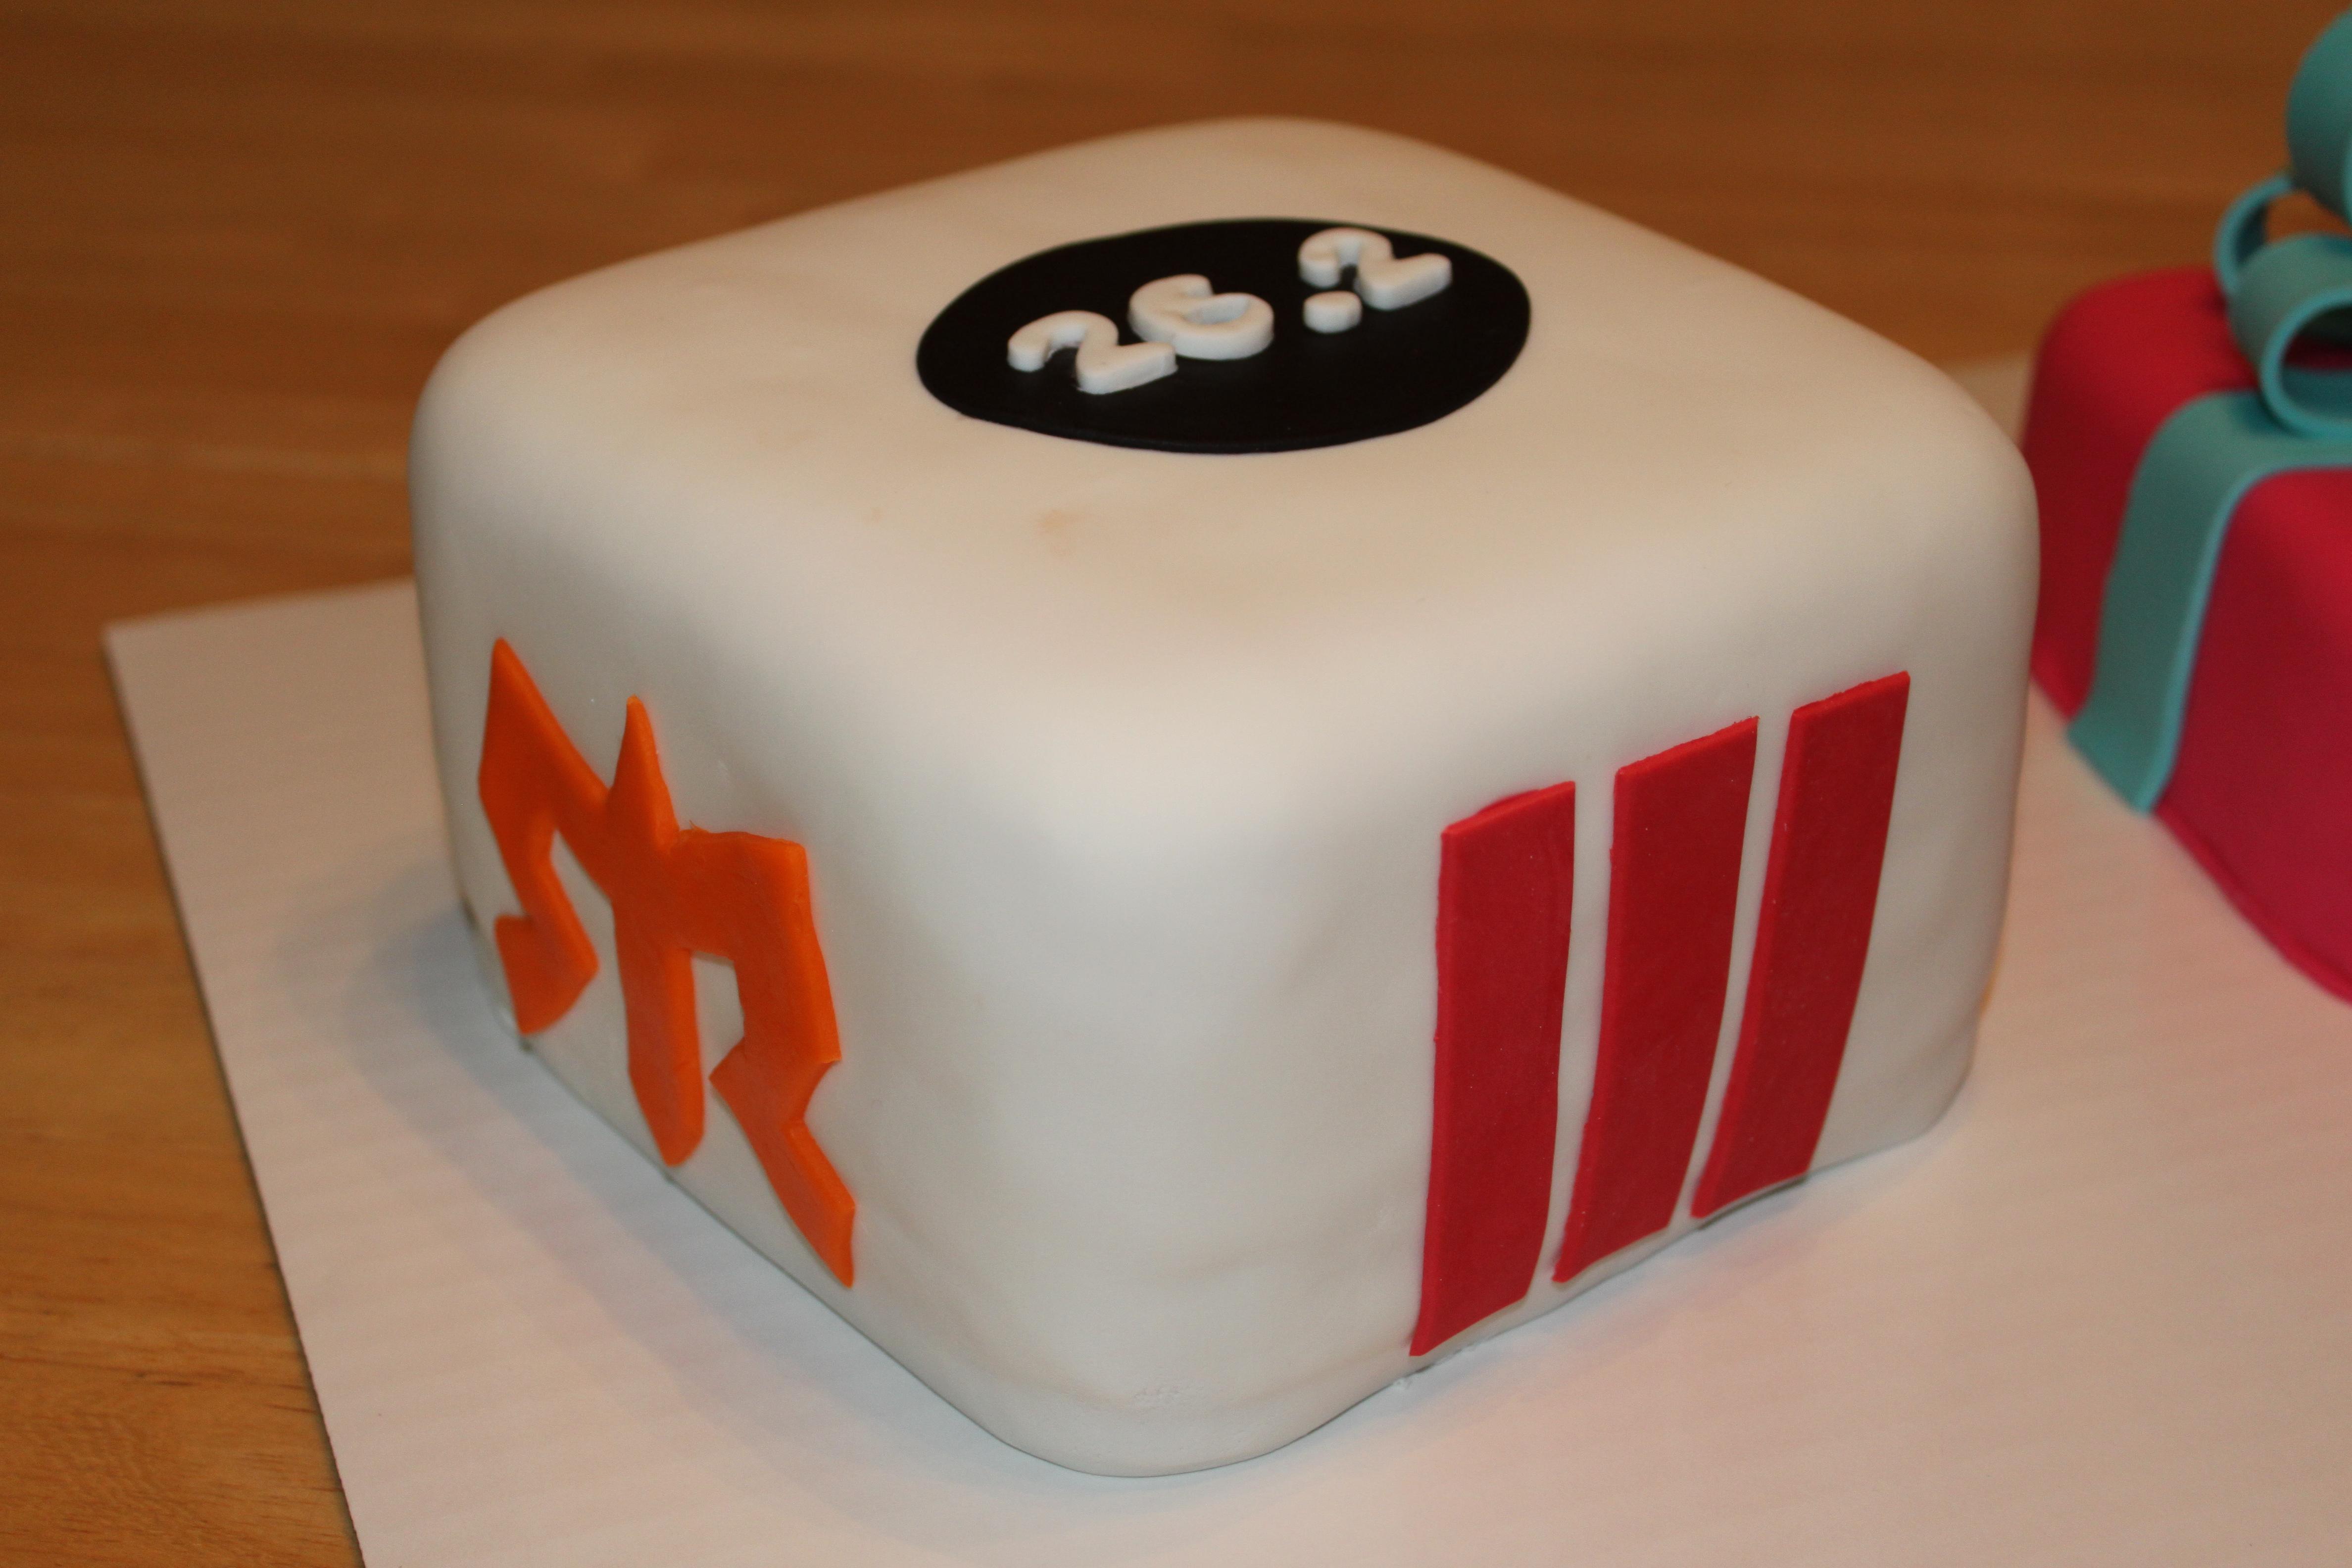 Awesome Marathon Logos And Birthday Present Fondant Cakes Pennys Food Blog Funny Birthday Cards Online Drosicarndamsfinfo